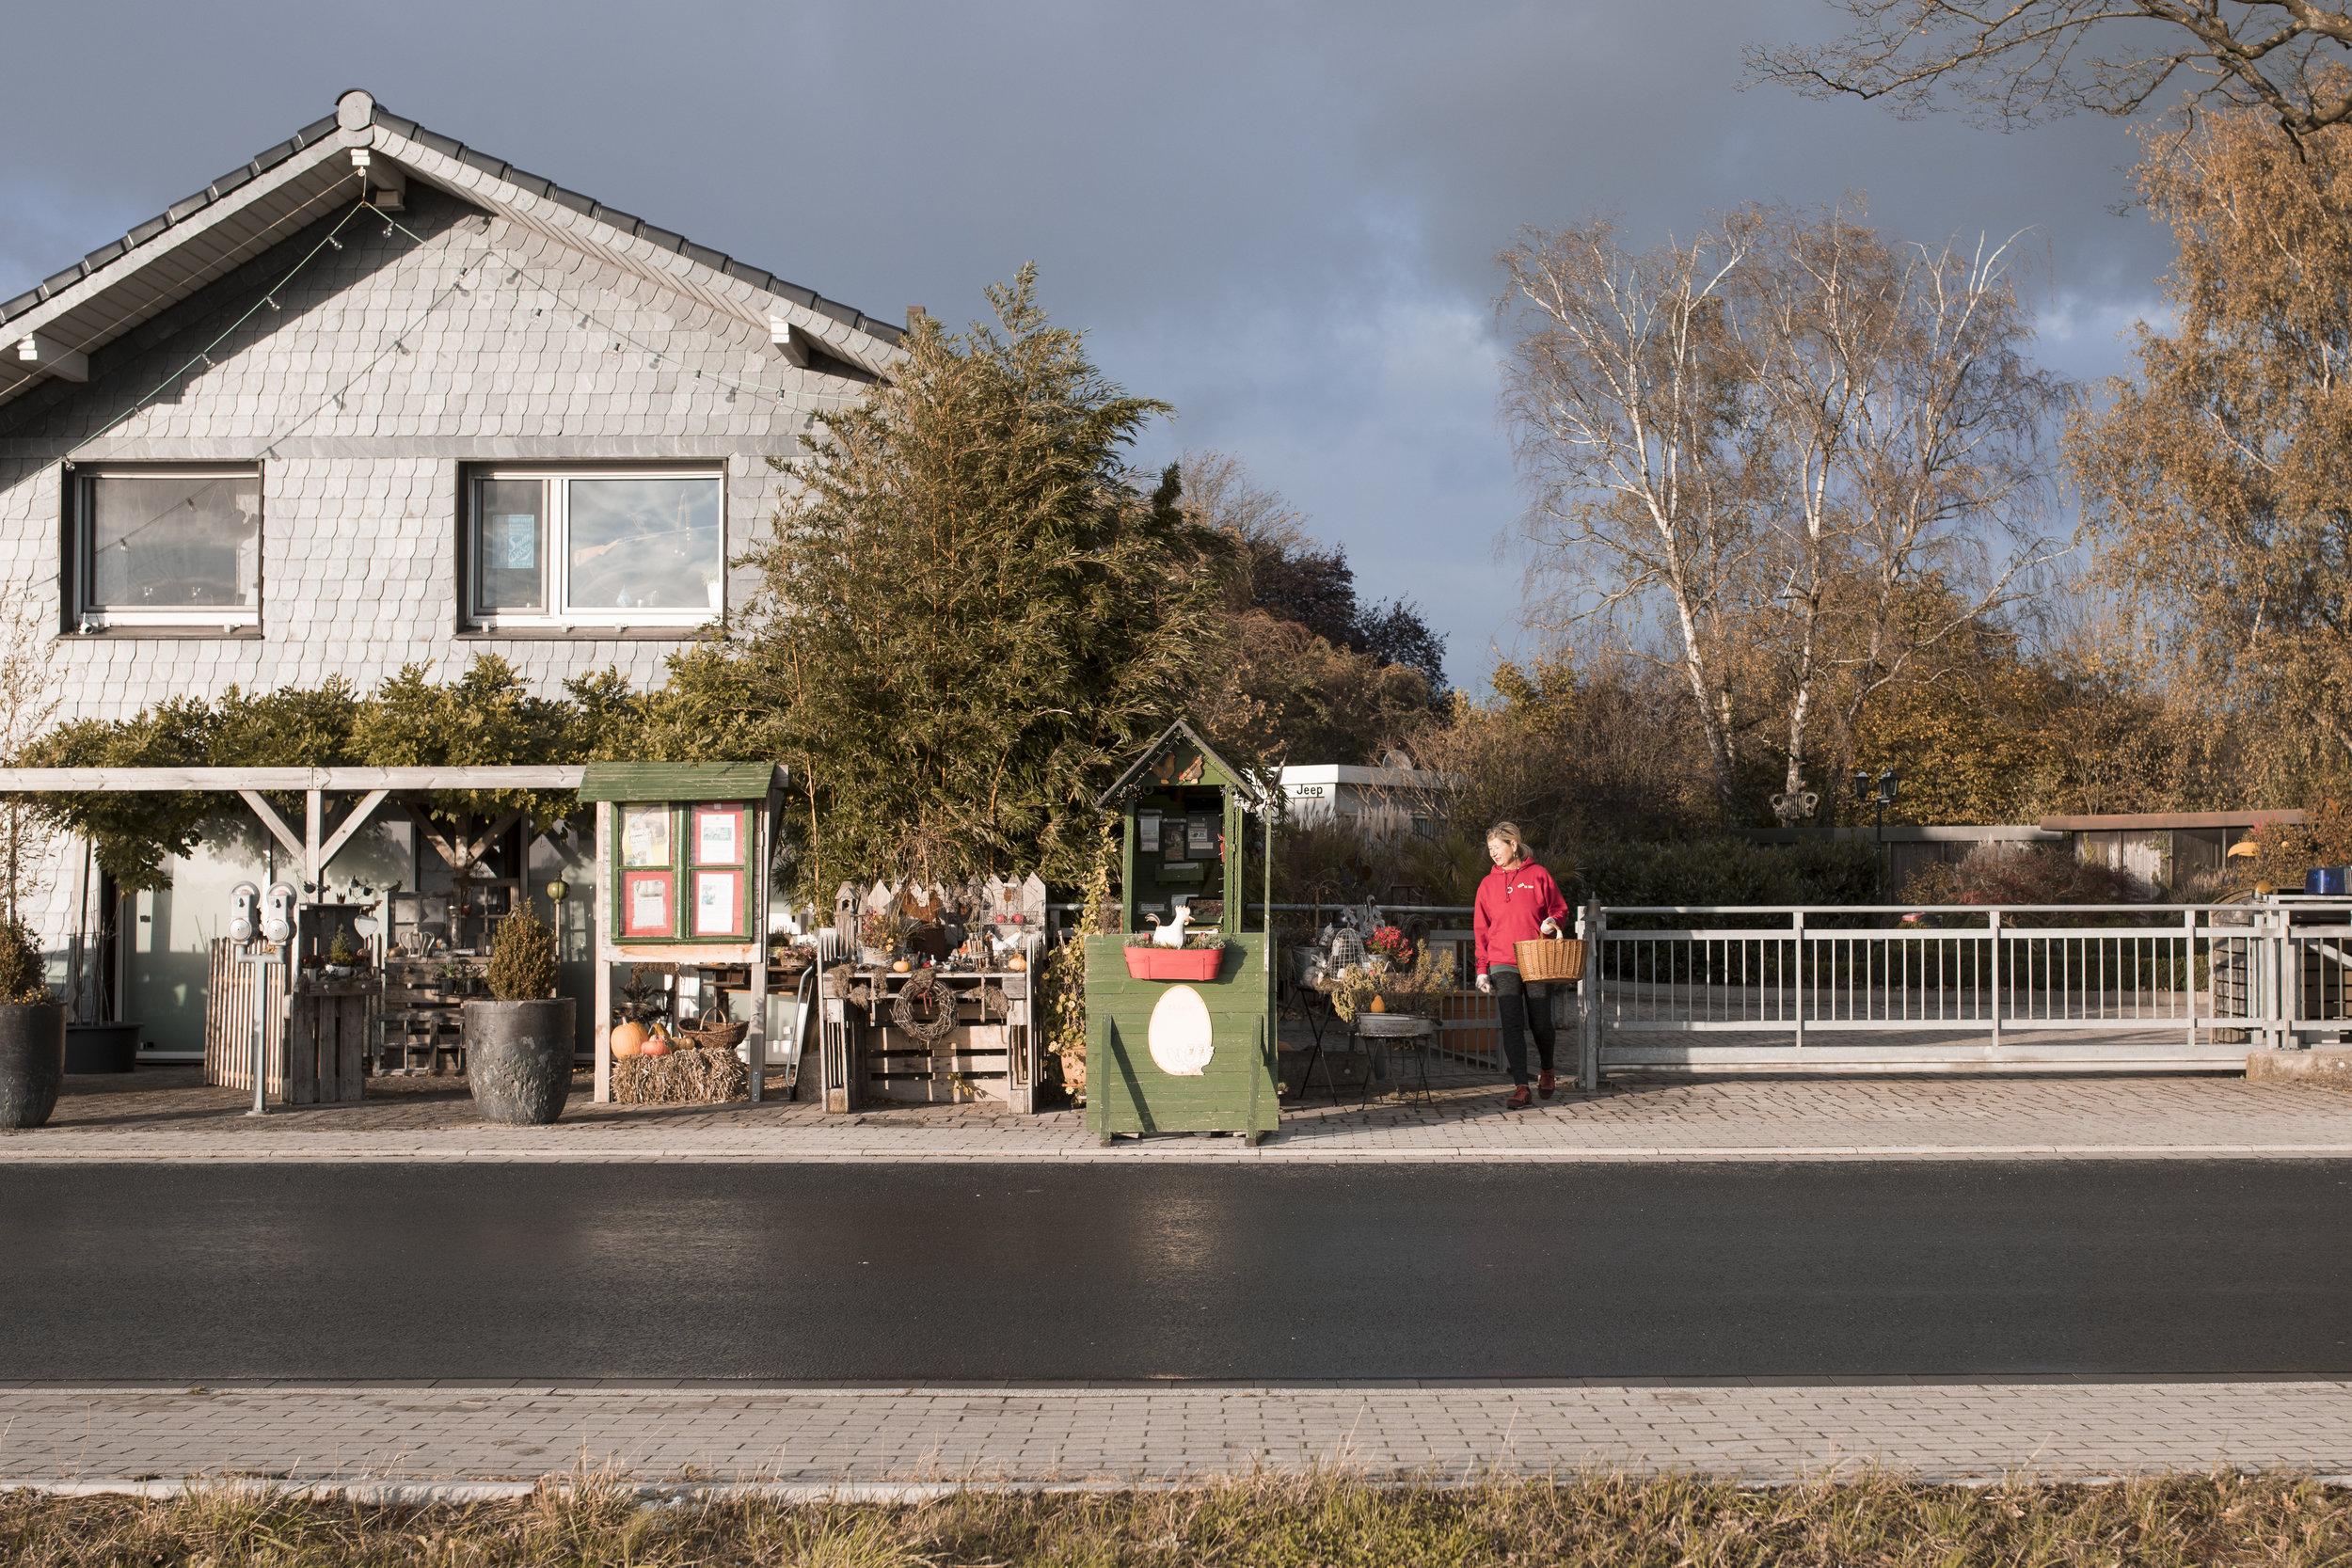 Reportage-wir-in-der-region-Gabi Broer-014.jpg